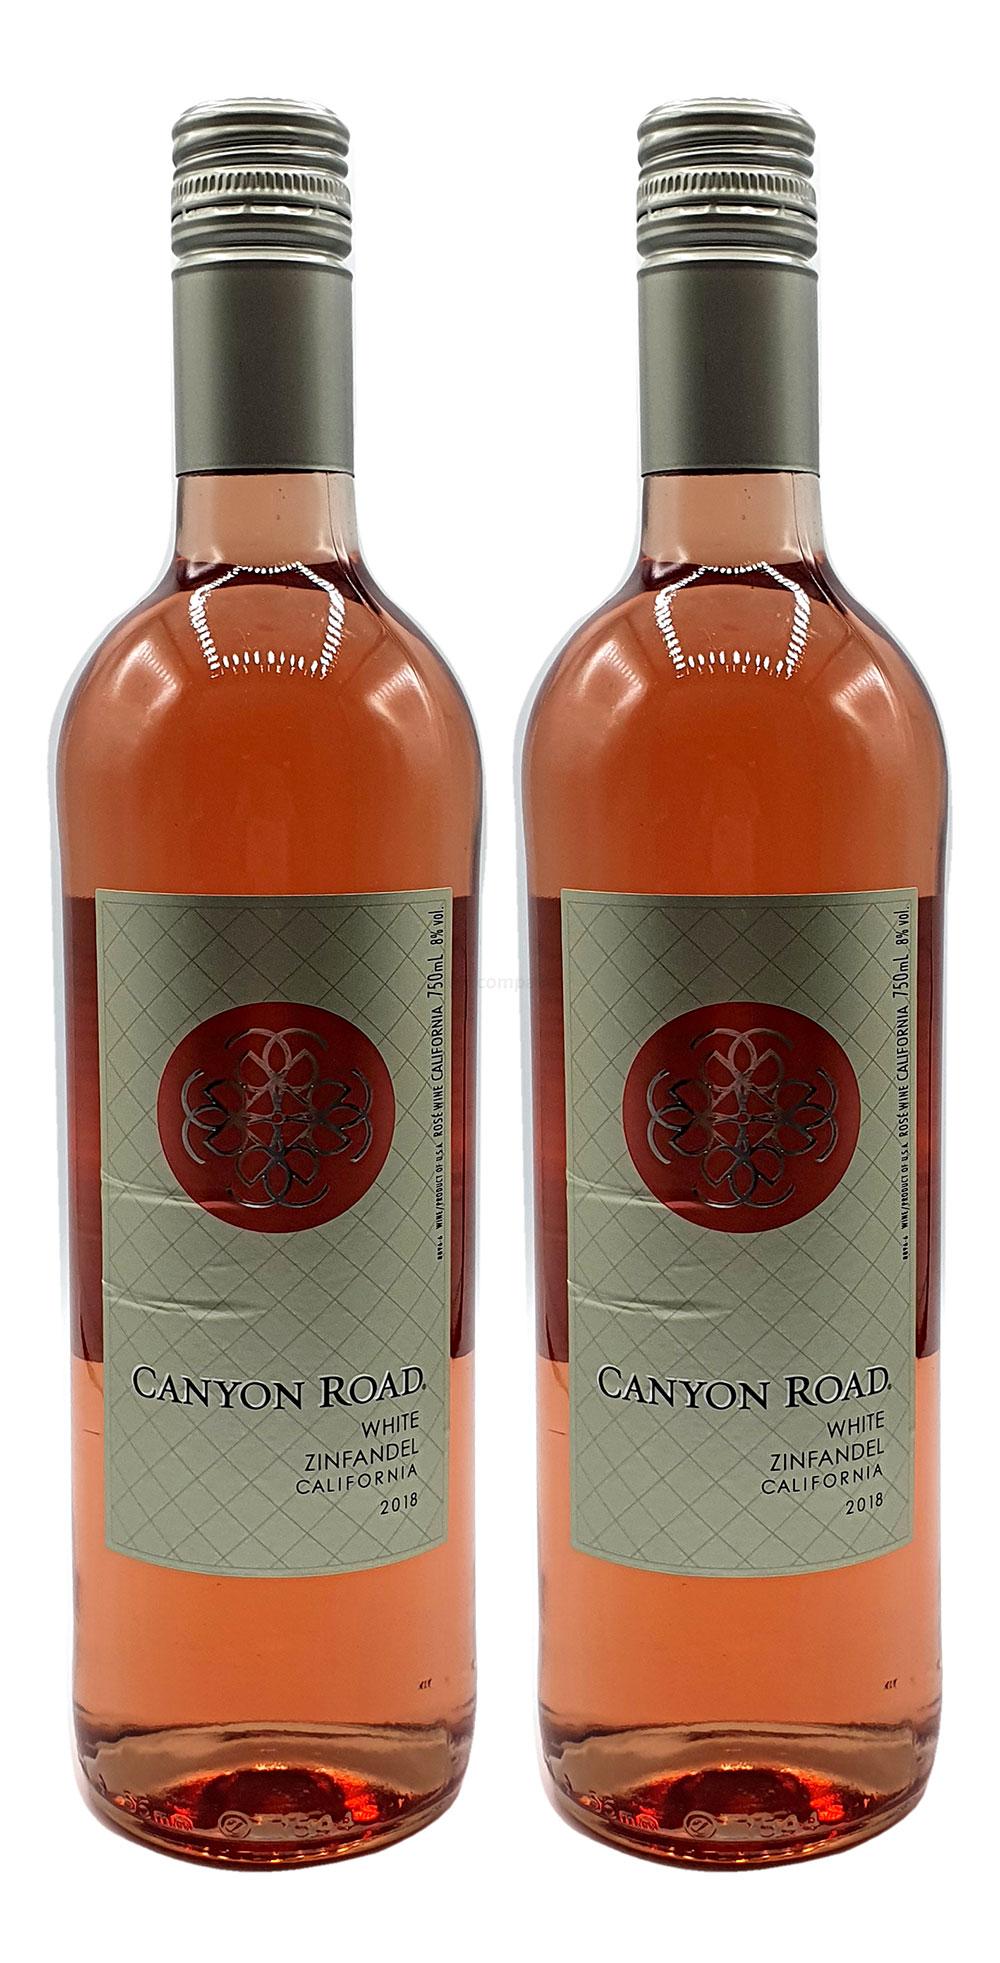 Rose Wein Set - 2x Canyon Road Zinfandel 750ml (8% Vol)- [Enthält Sulfite]